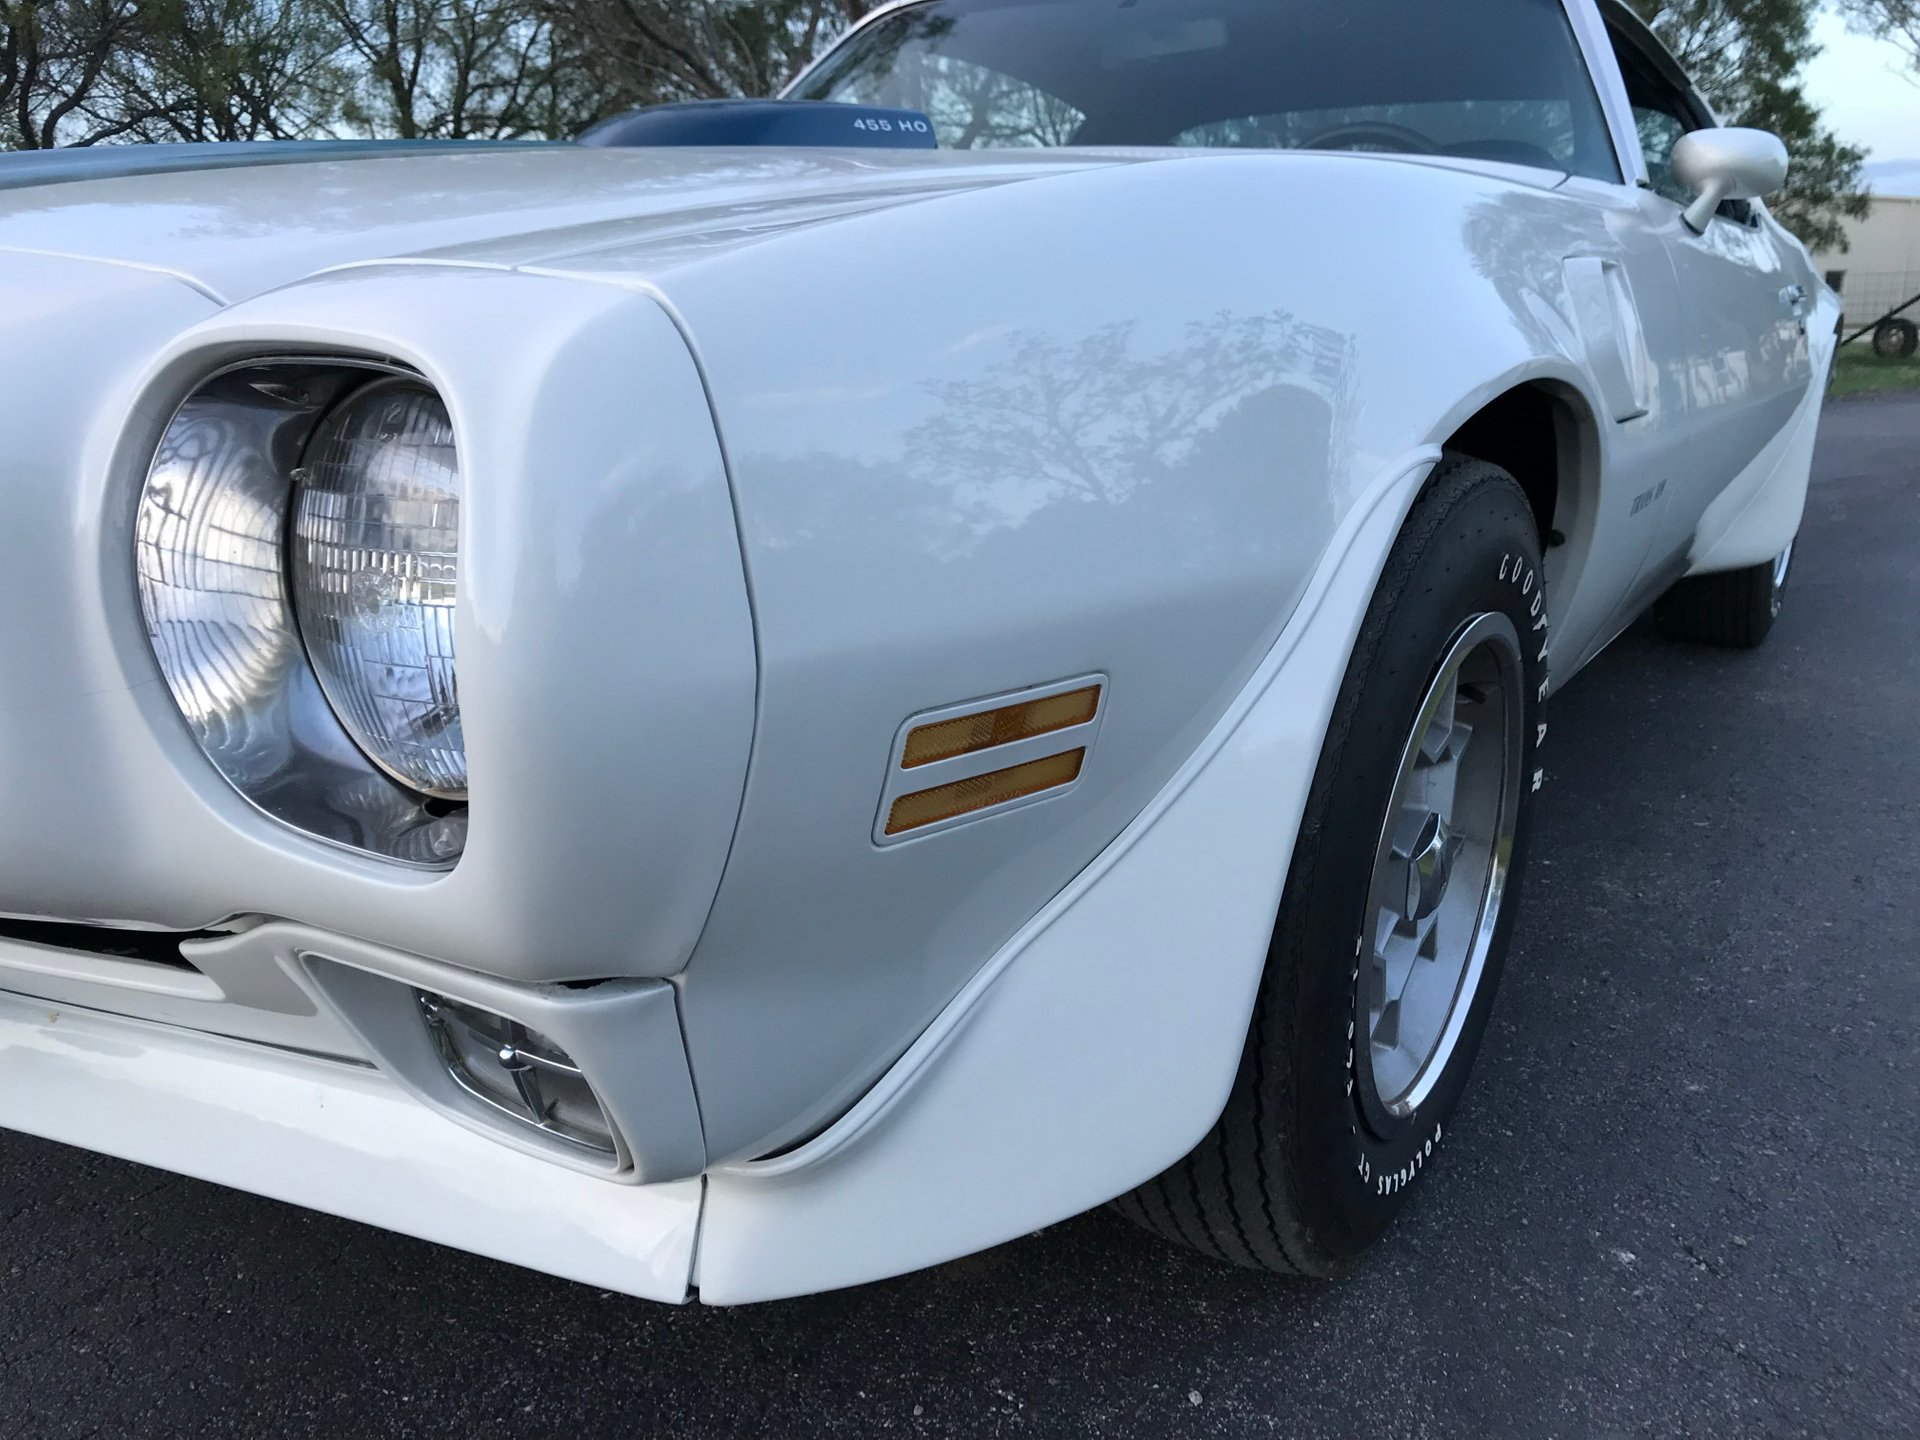 1972 Pontiac Trans Am 72 t/a 1 of 1286 H O 455 Turbo 400 AC PS PB